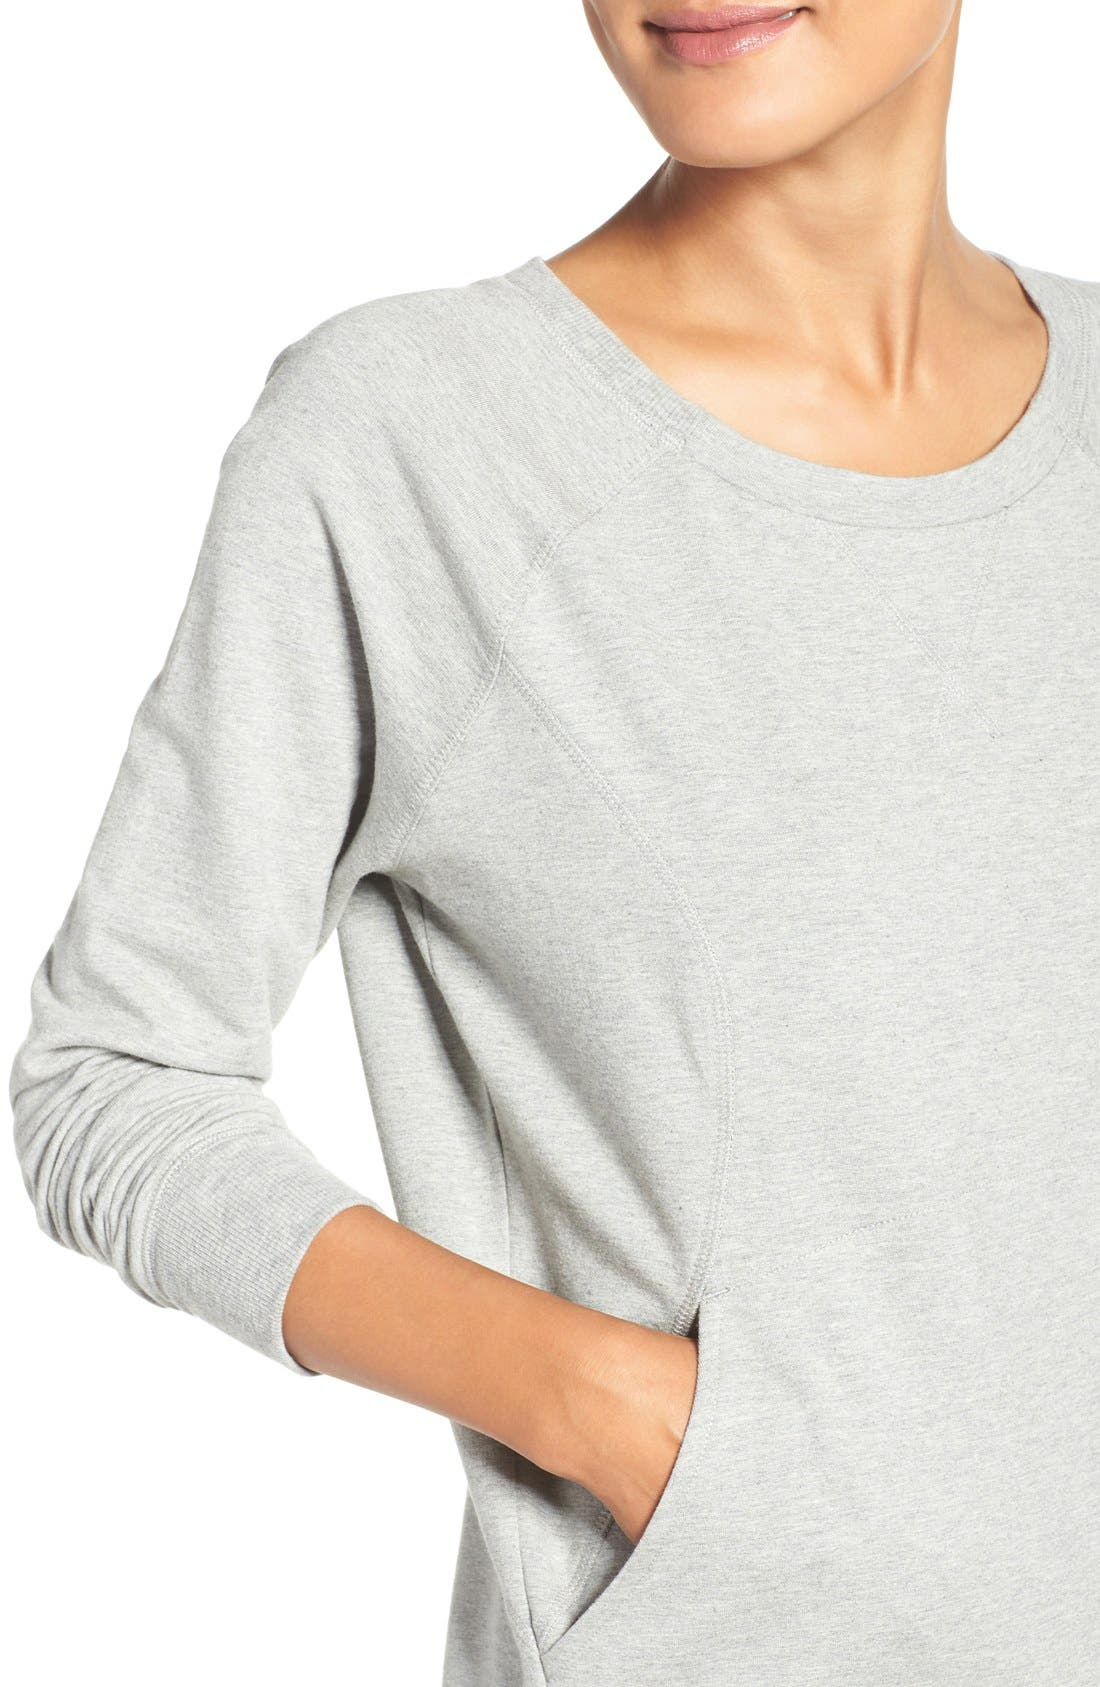 Alternate Image 4  - Zella 'Luxesport' Long Sleeve Sweatshirt